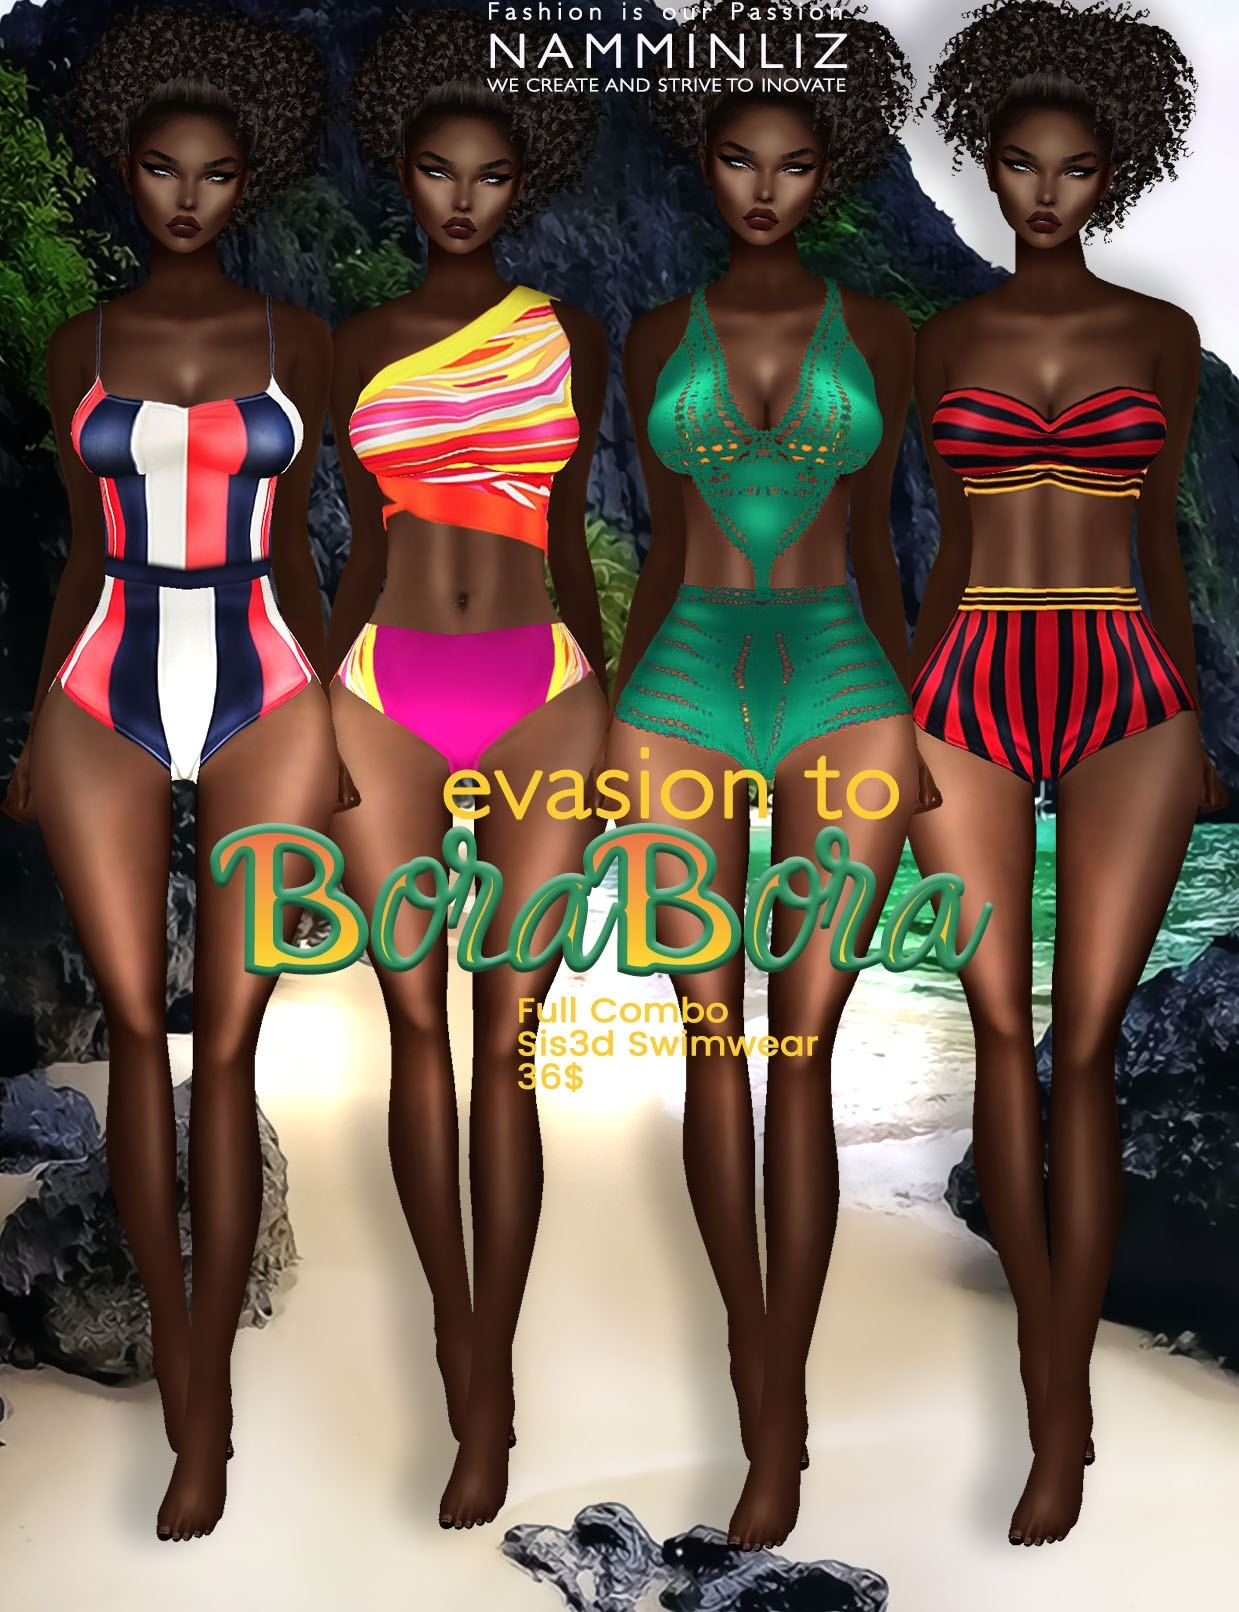 Evasion to Bora Bora full combo Sis3d swimwear imvu NAMMINLIZ